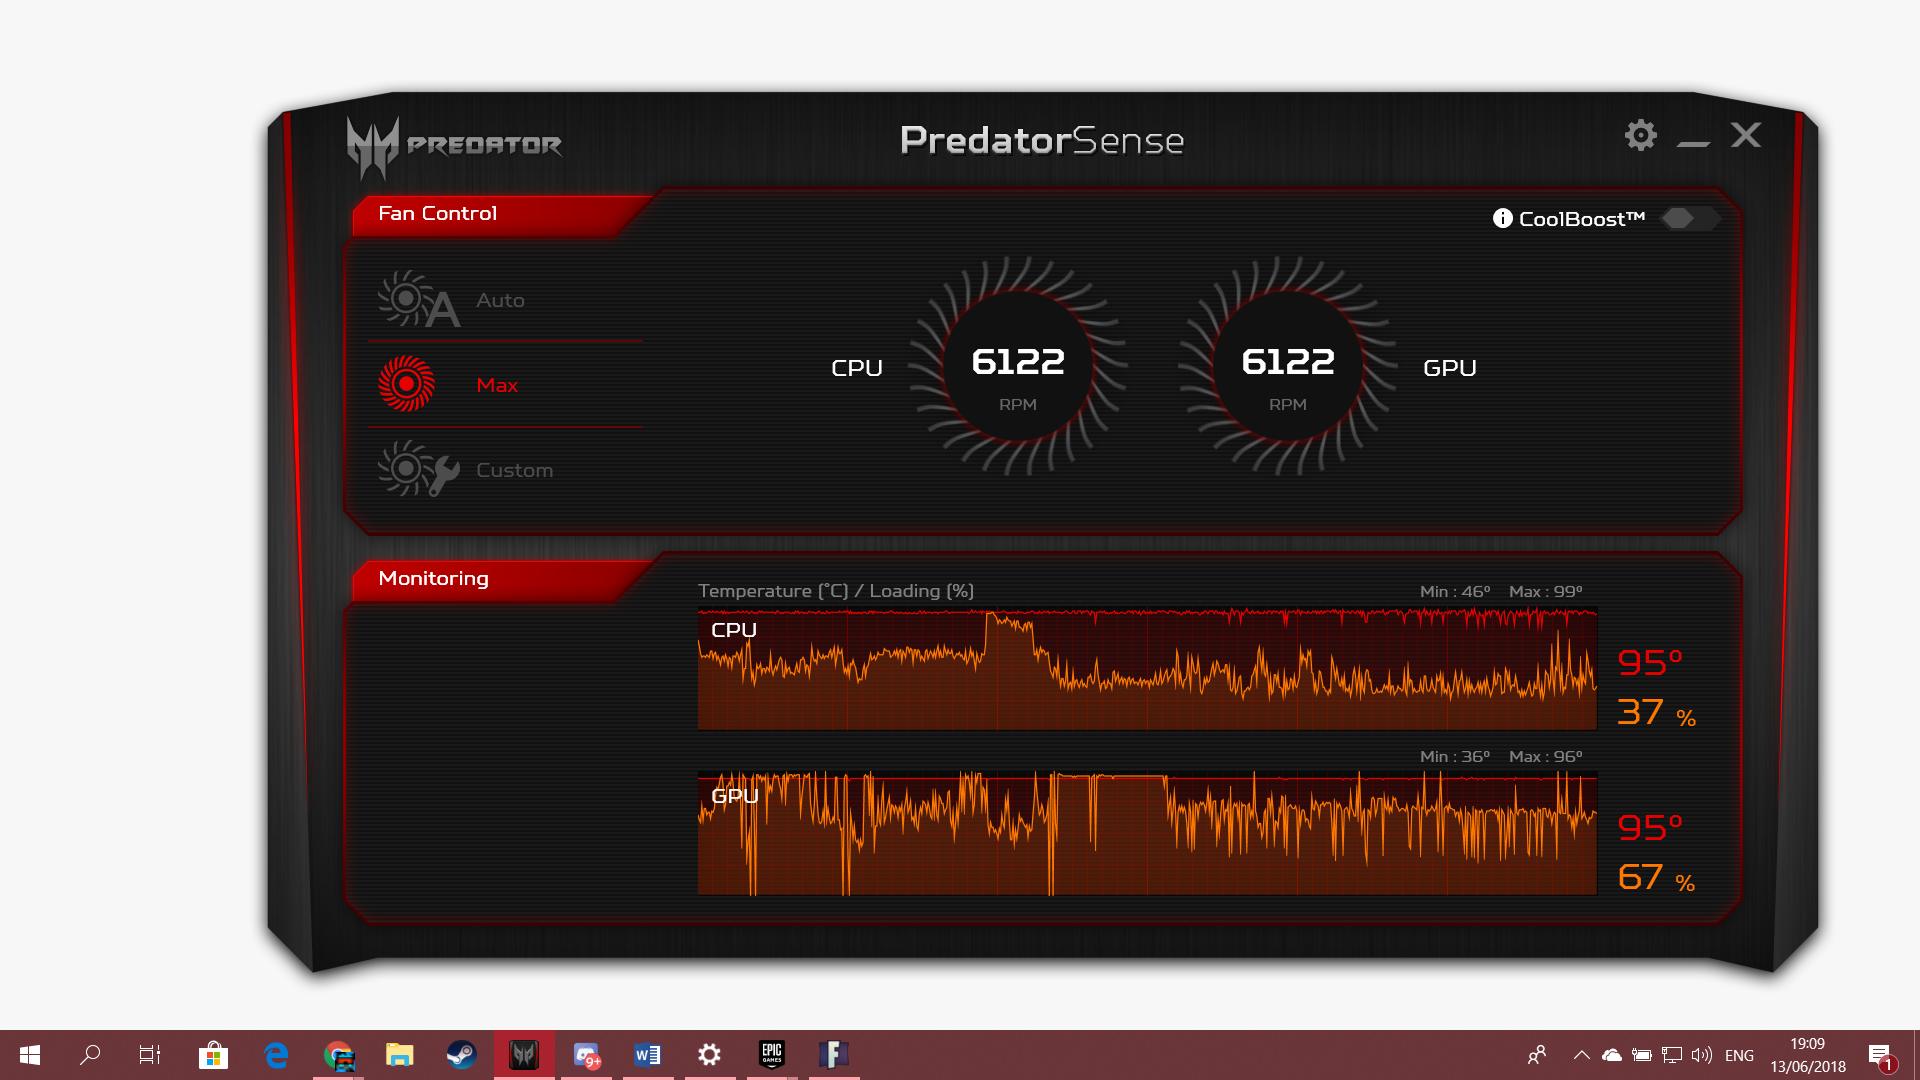 Predator Helios 300 gtx 1060 95-97 degrees Celsius on gaming